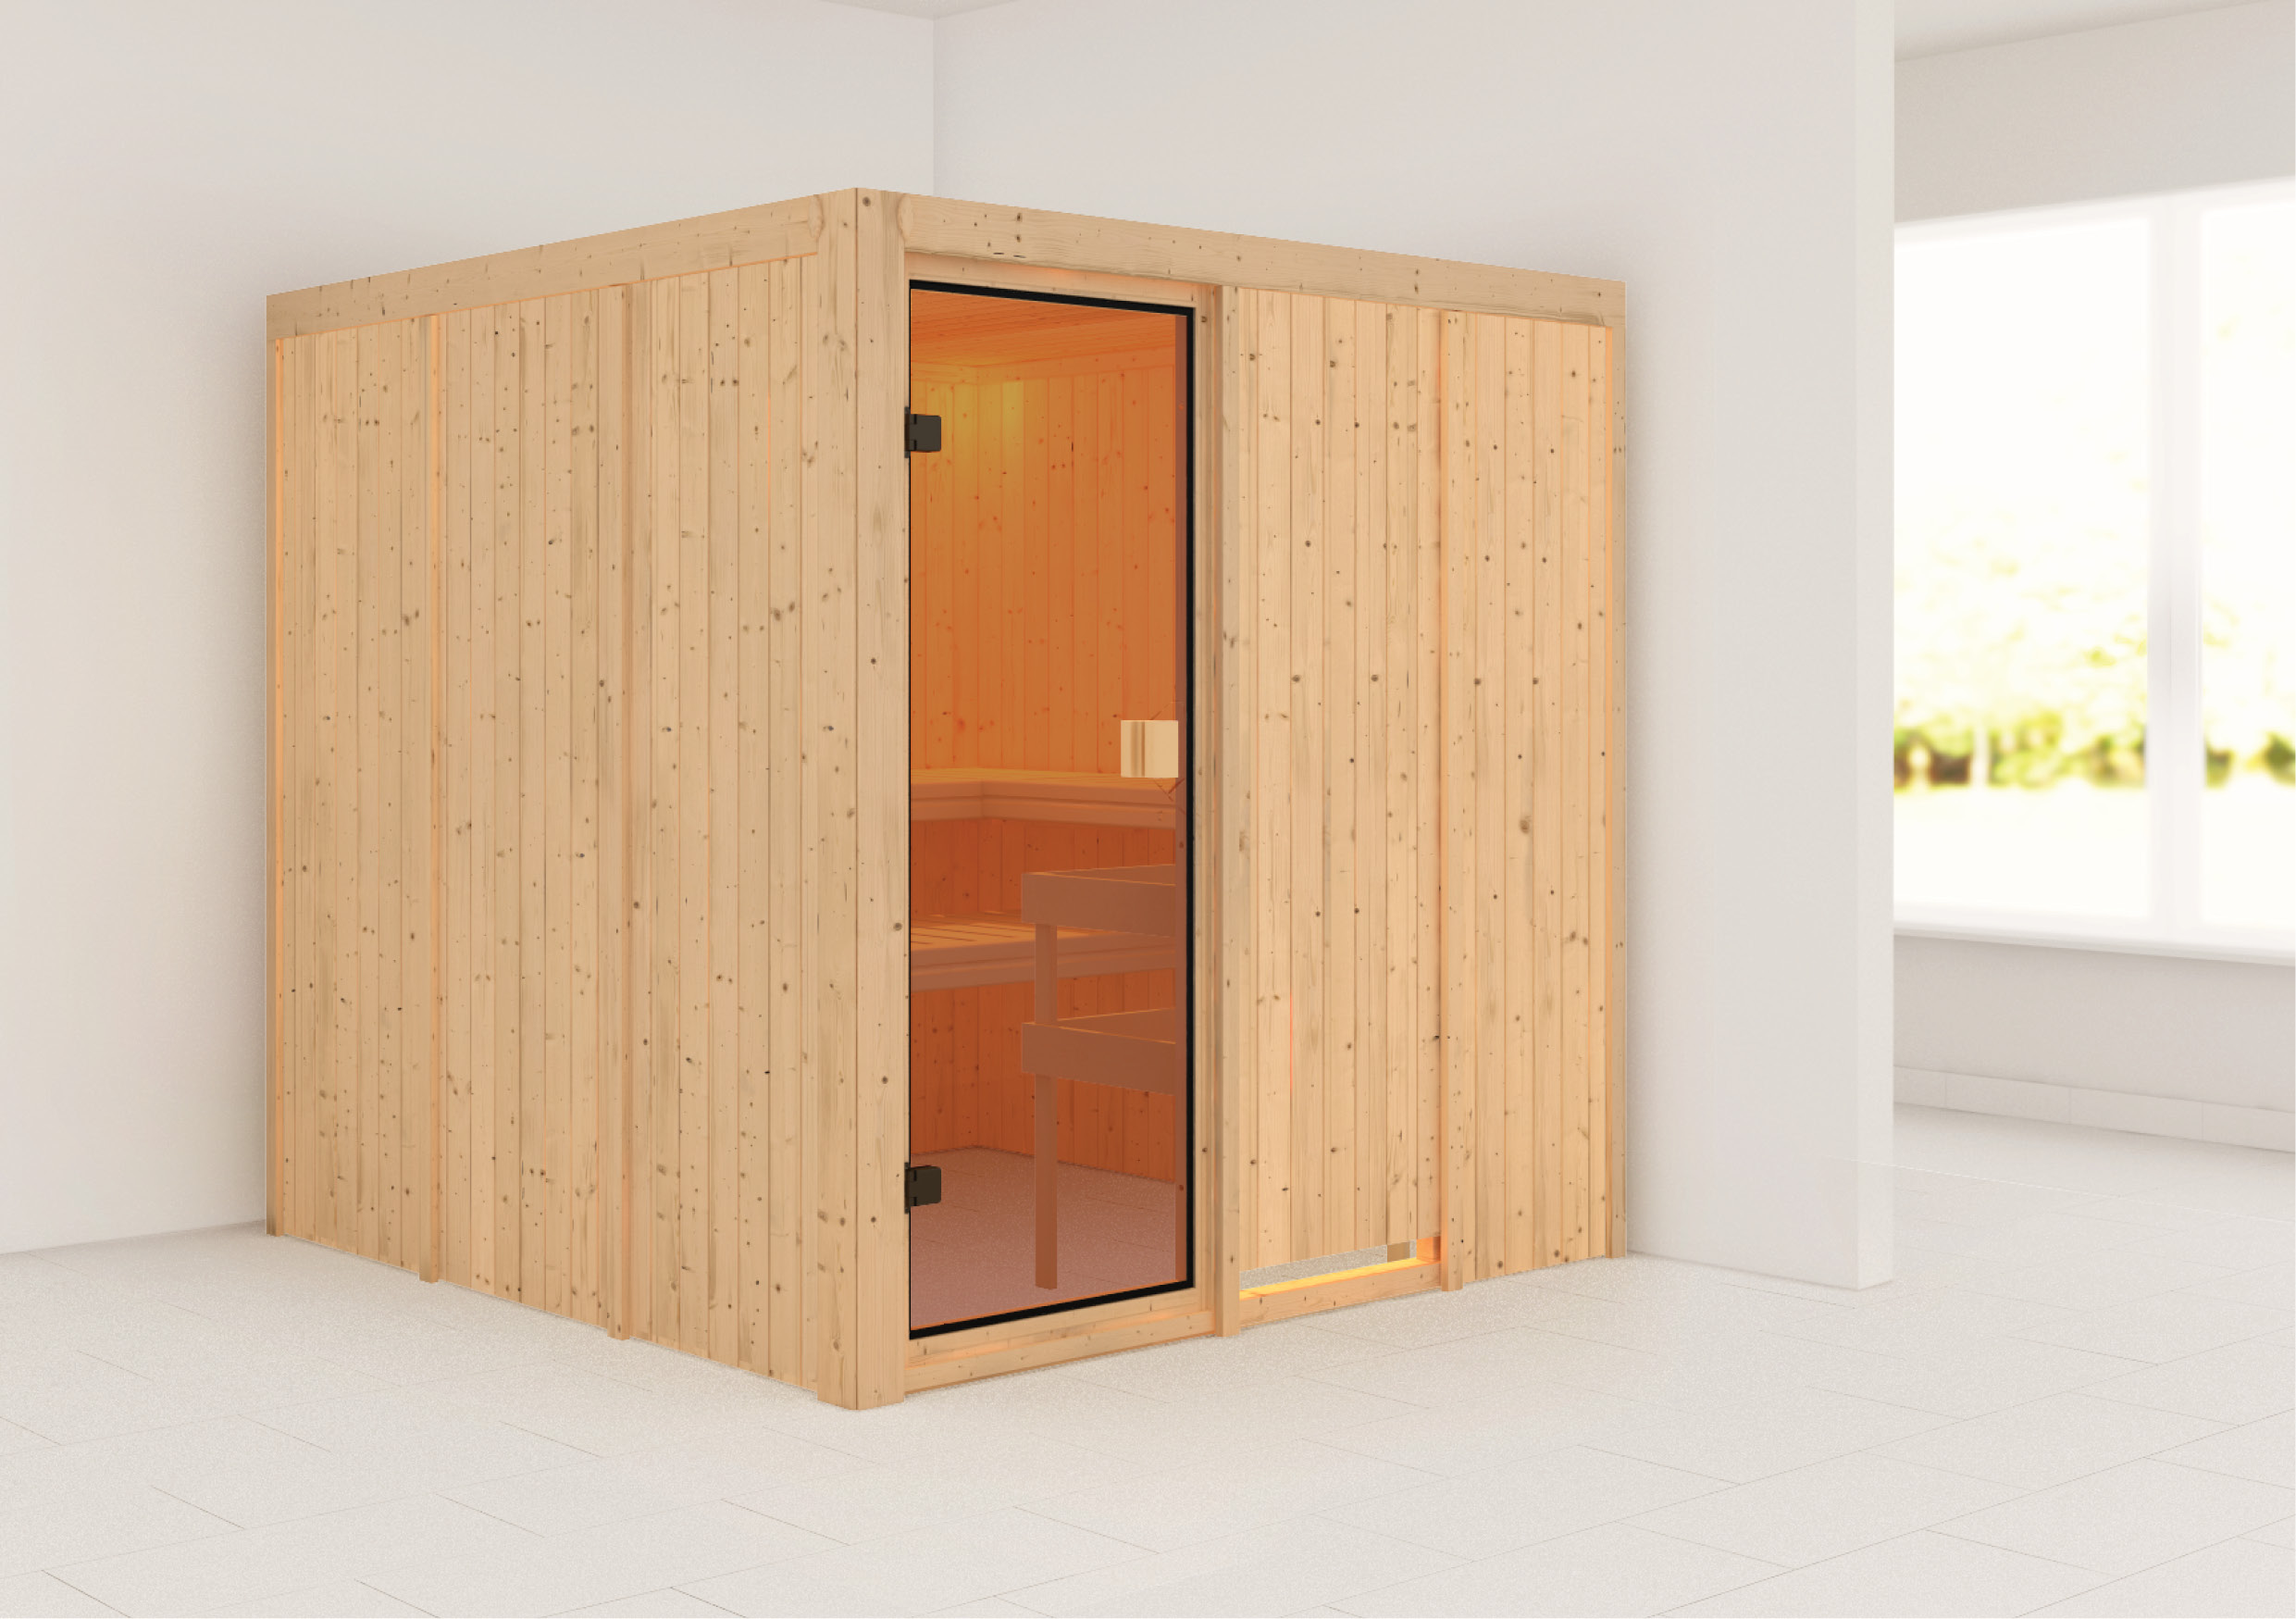 Woodfeeling Sauna Oulu 68mm ohne Saunaofen Bild 1